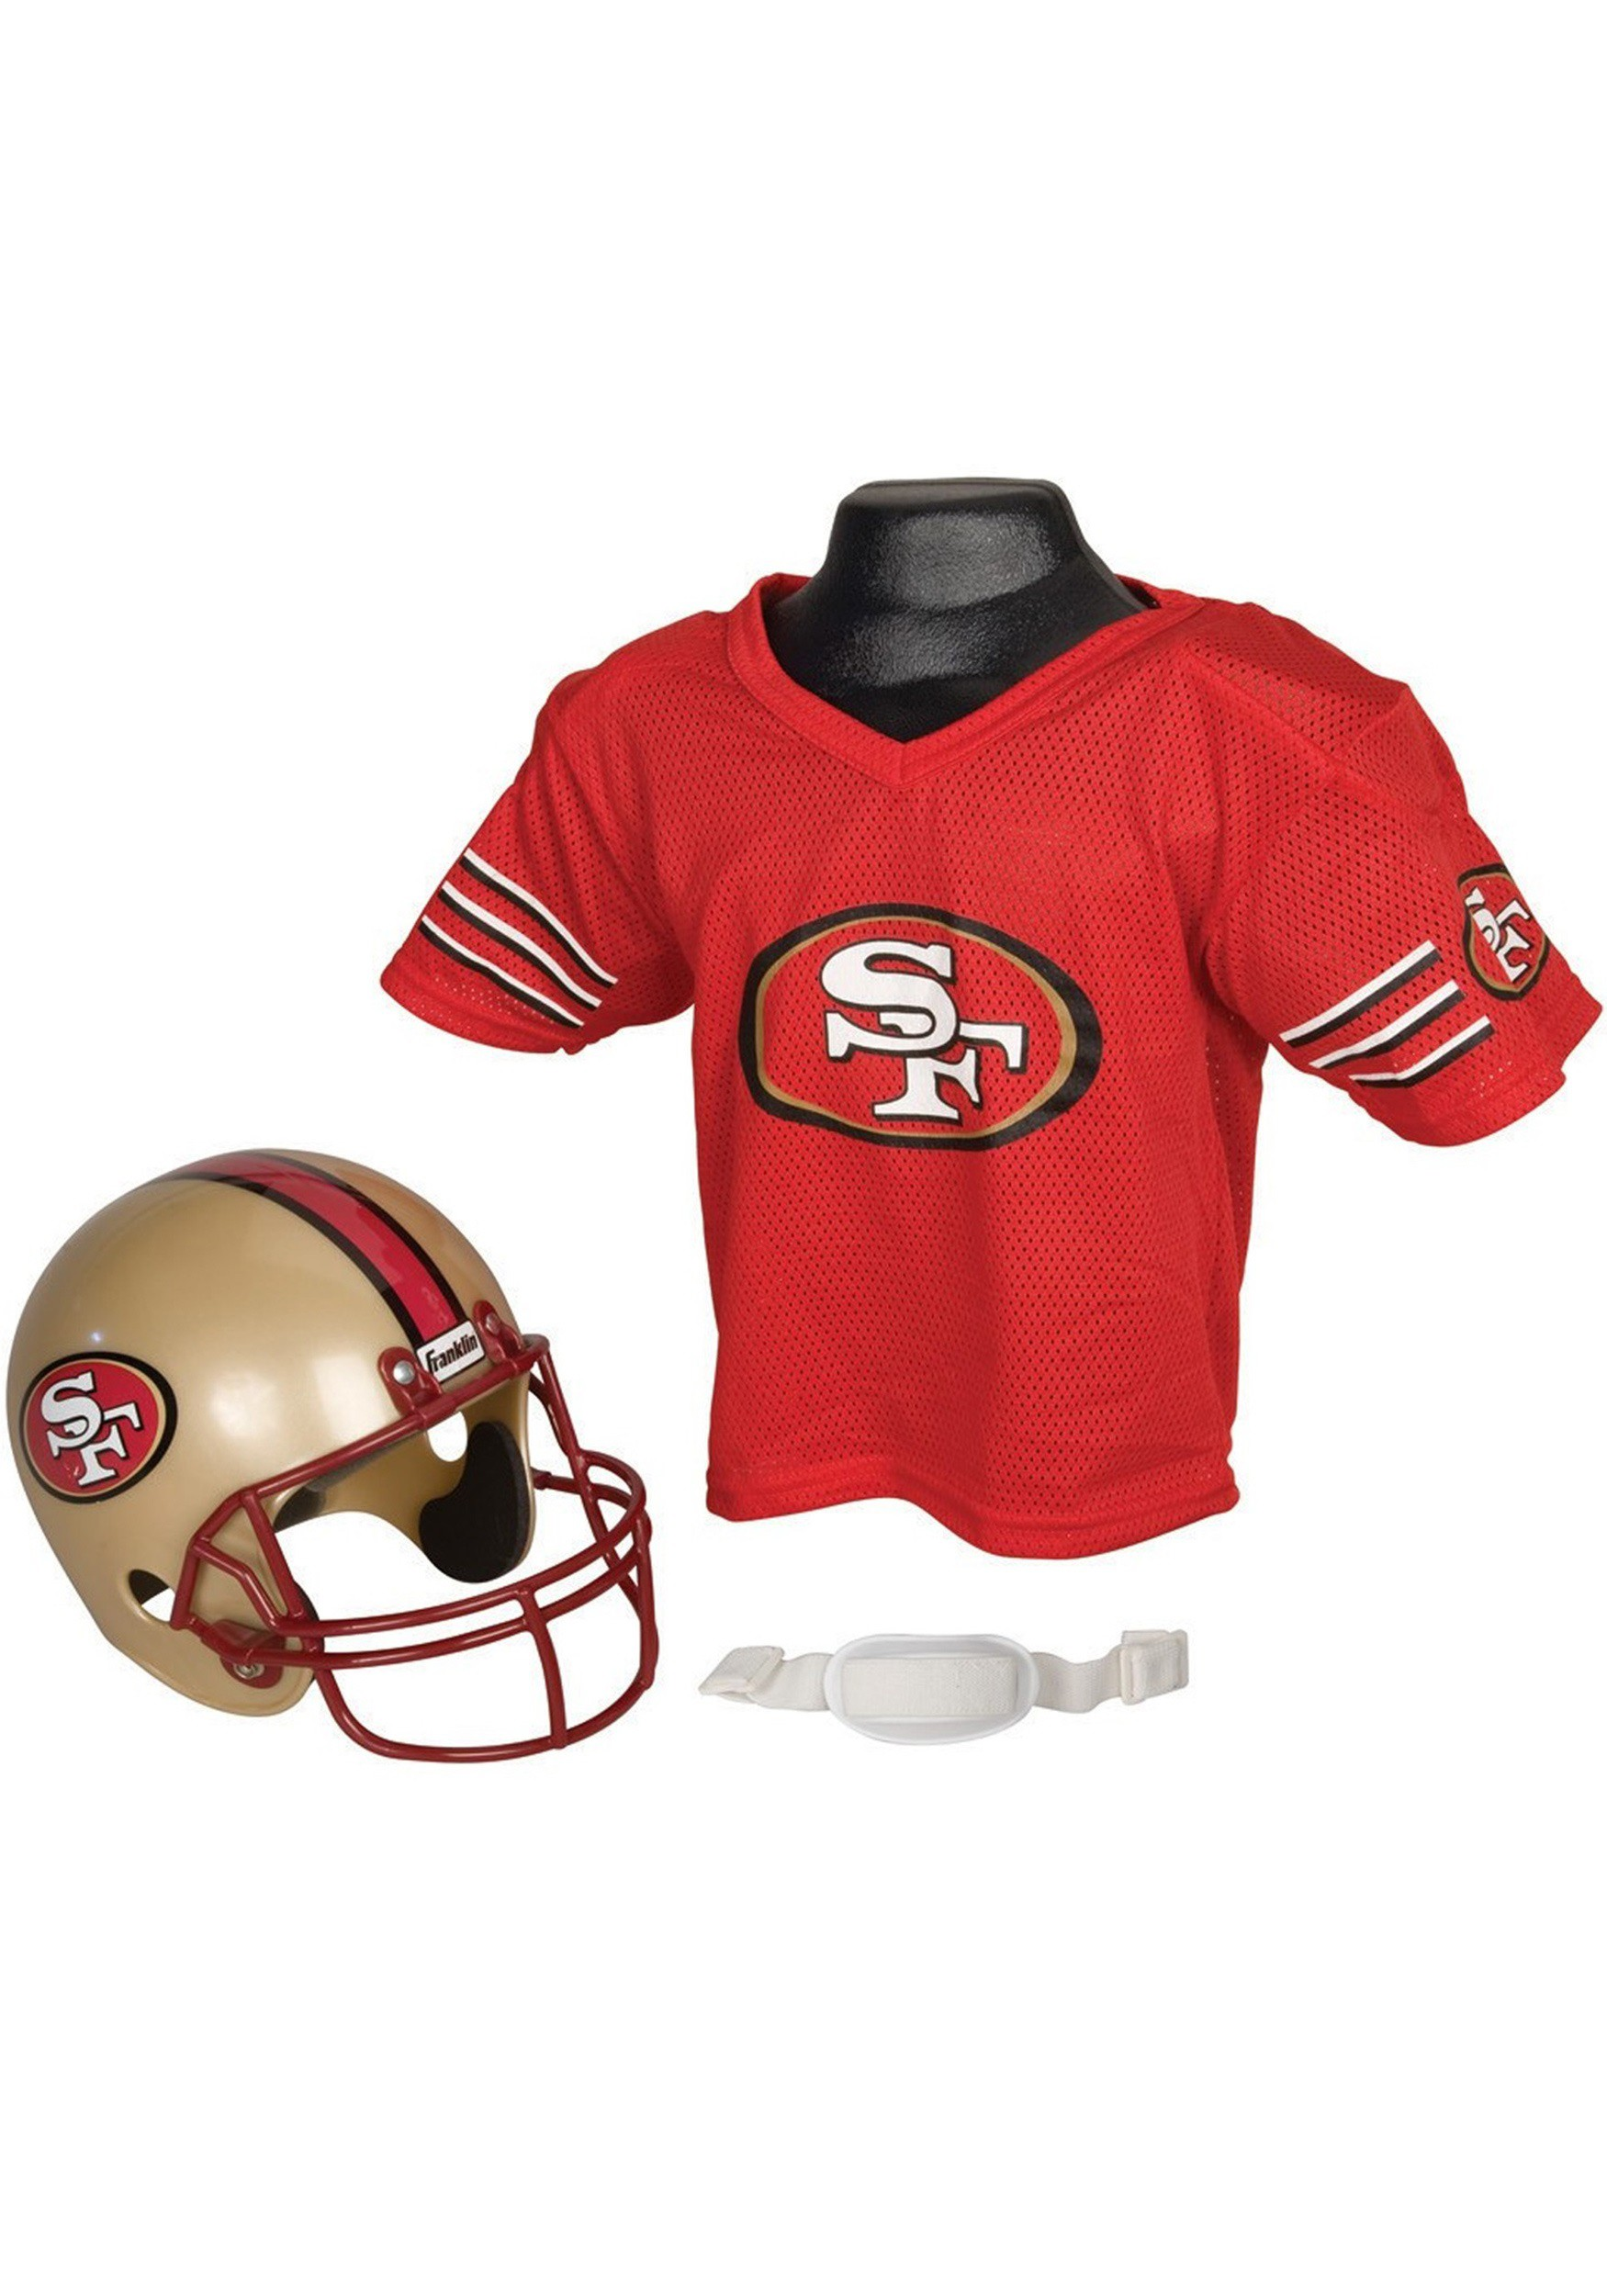 384f0b4e Child NFL San Francisco 49ers Helmet and Jersey Set